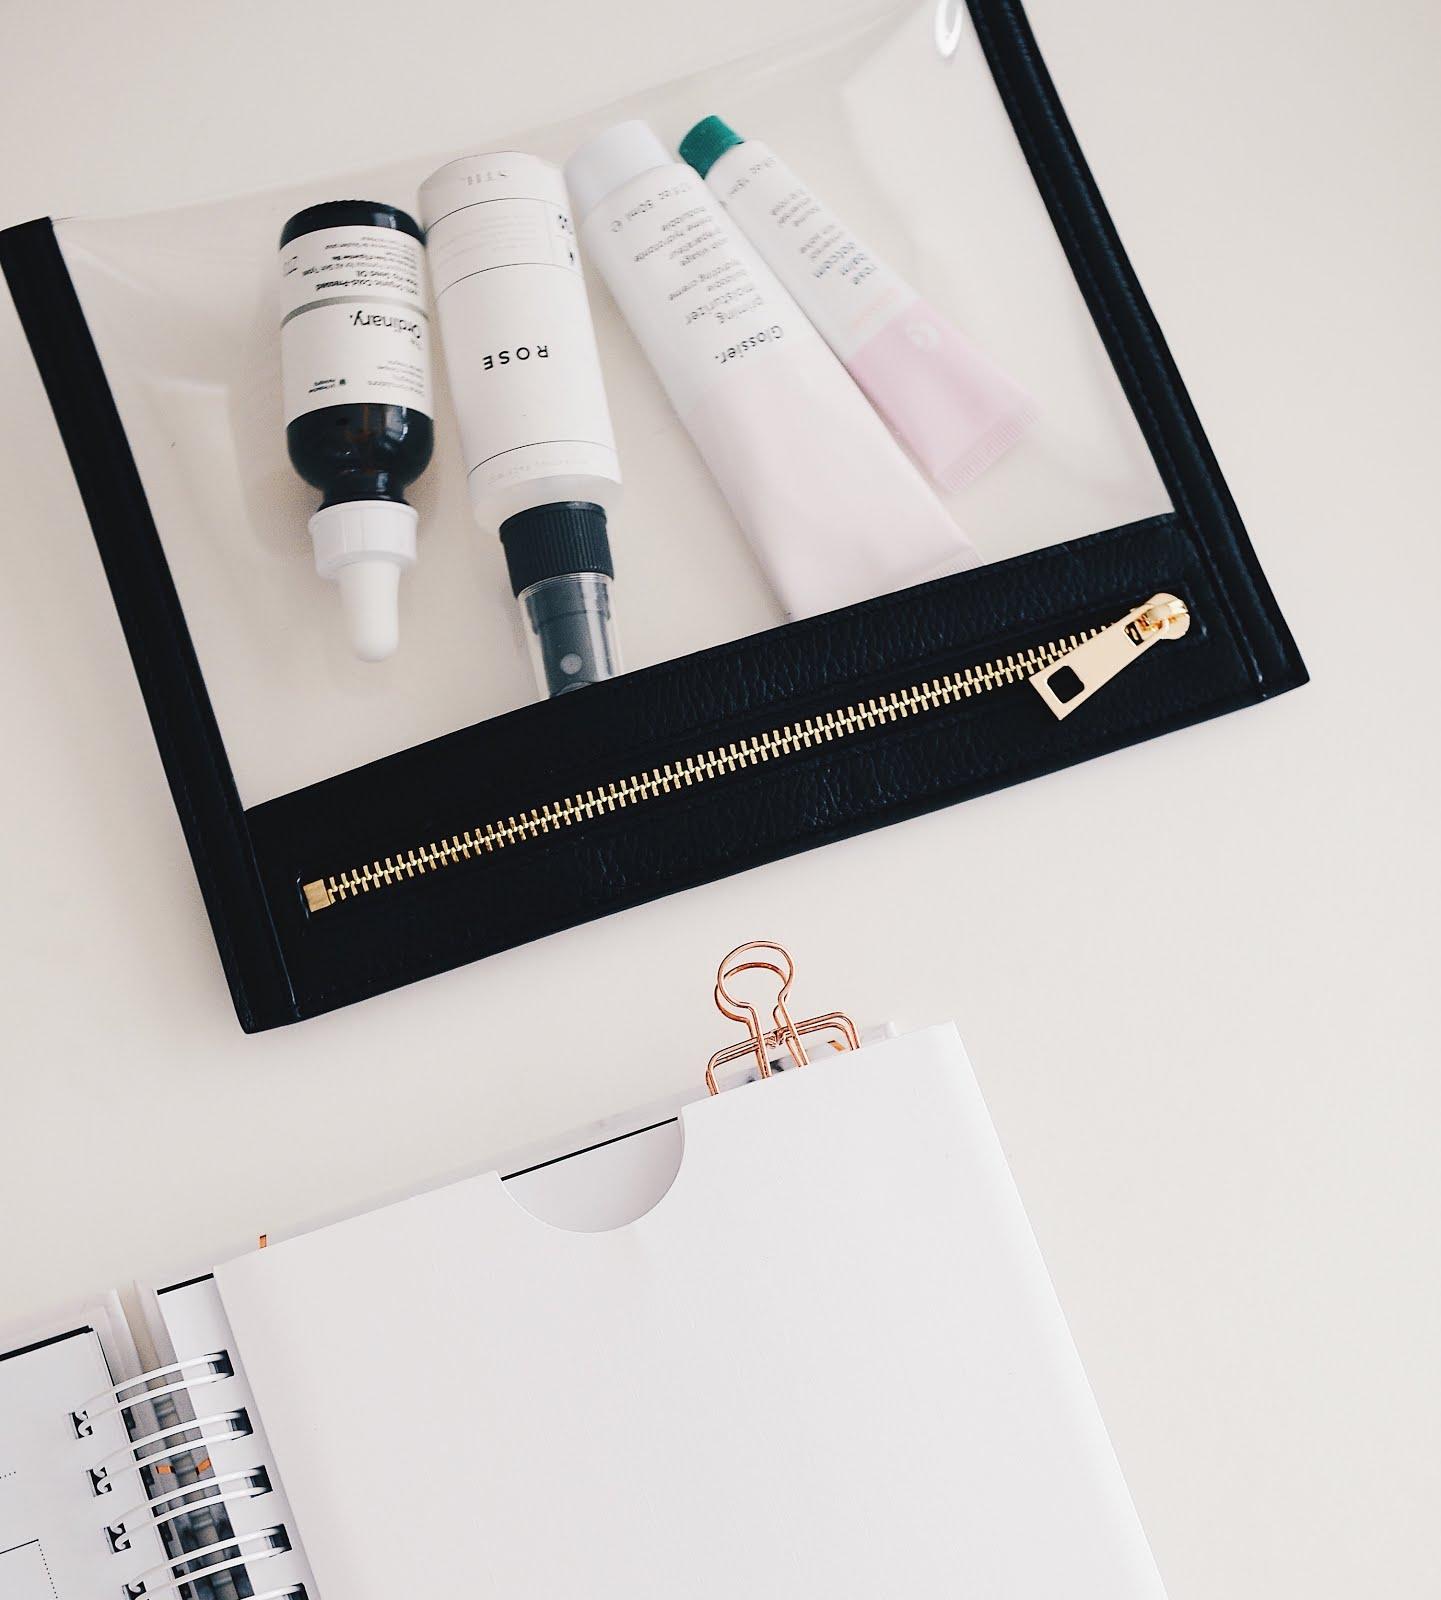 moisturizer lotion mini beauty winter dryness dry cold flakey skin